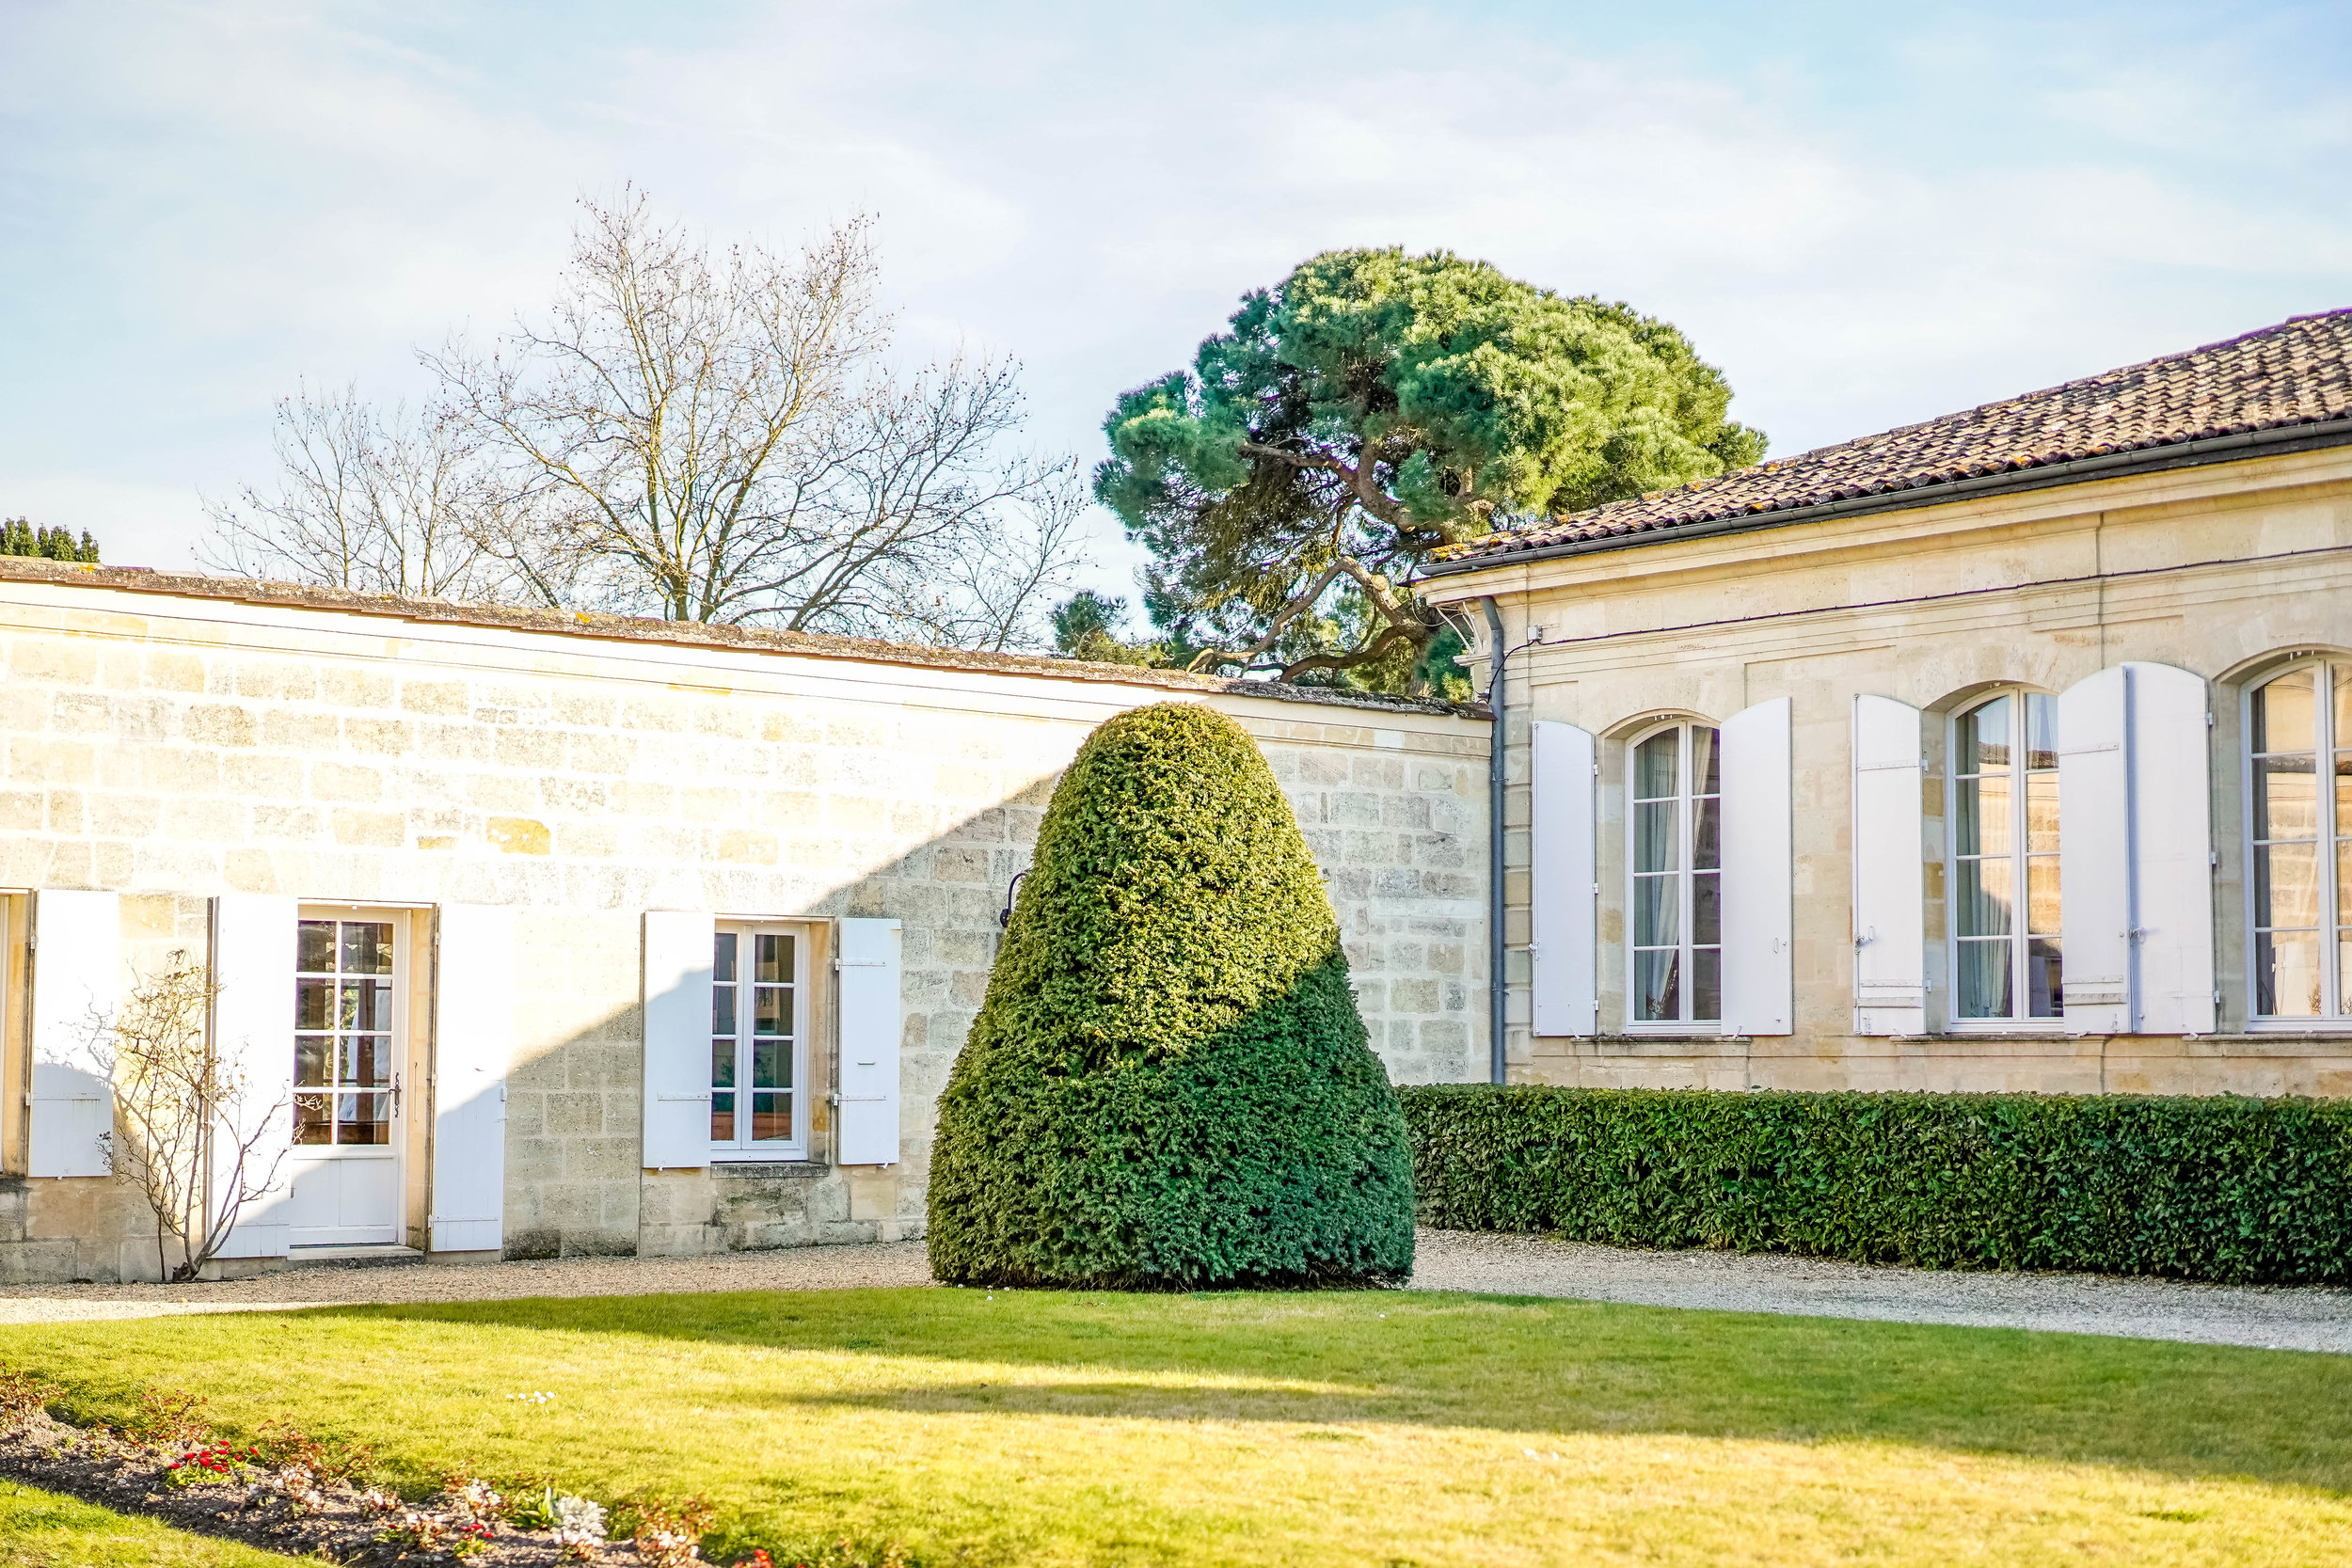 Barton & Guestier's Chateau Magnol